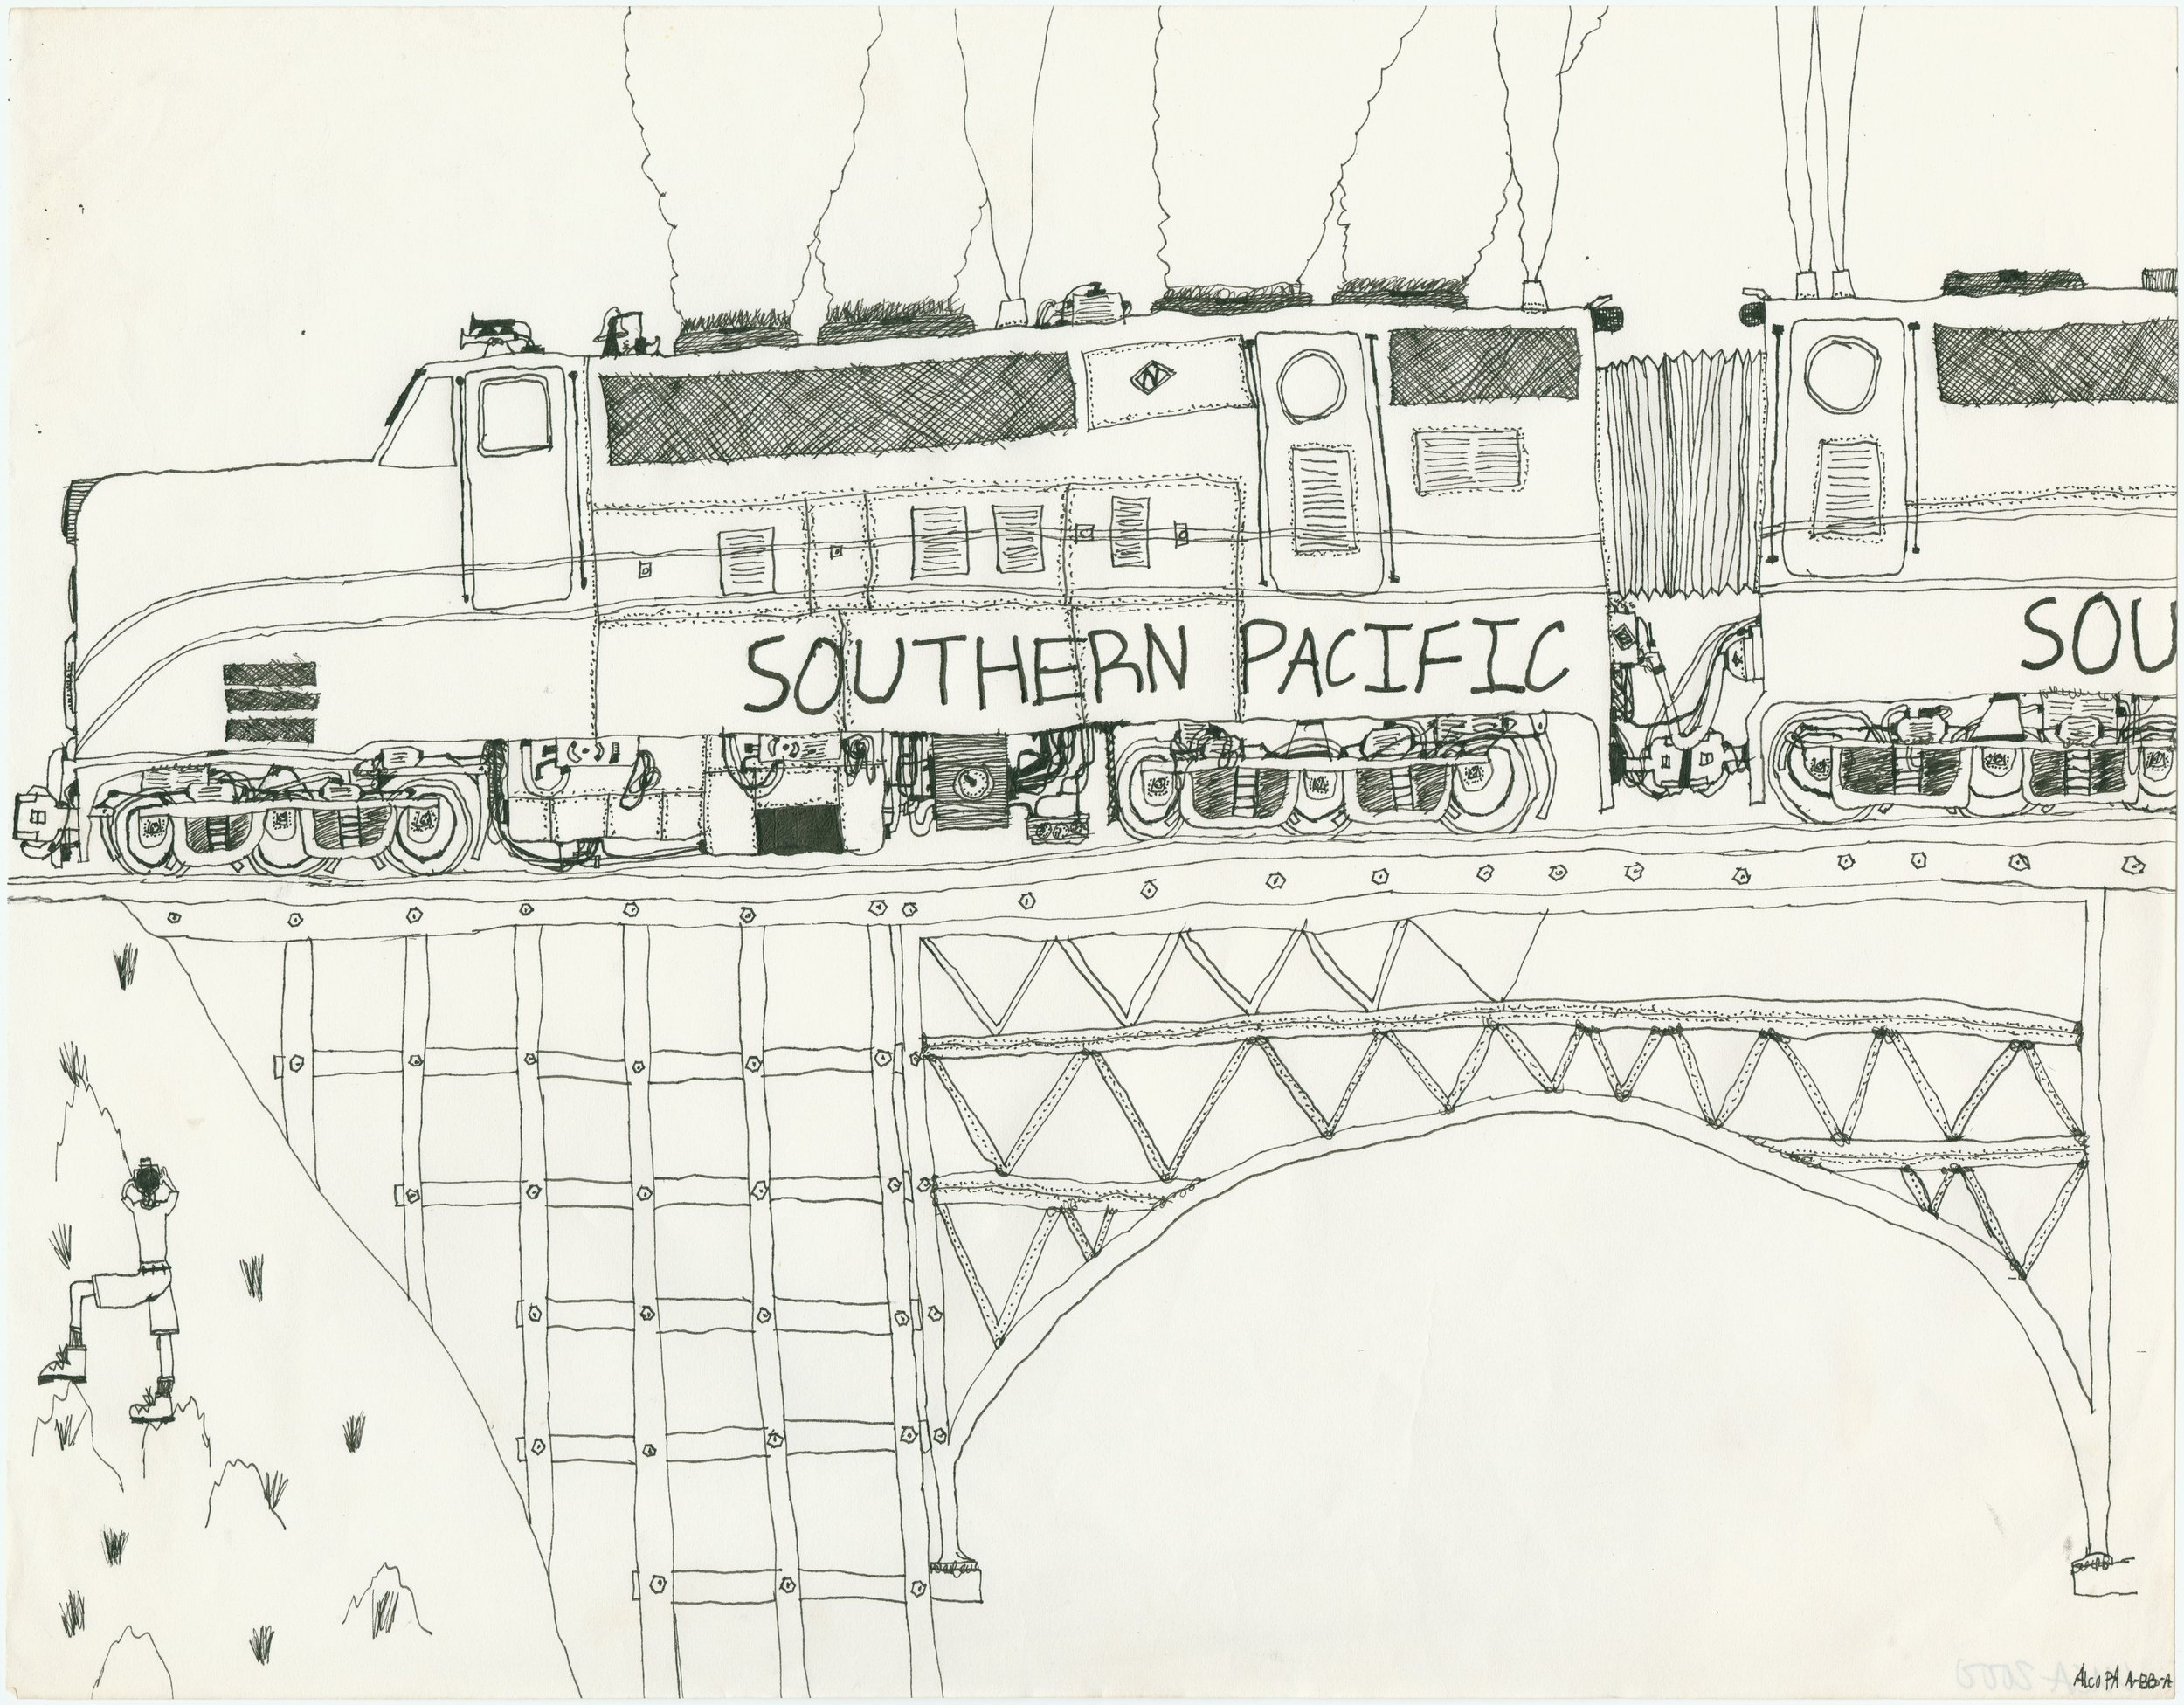 2000 - 001 - Southern Pacific.pdf0000.jpg